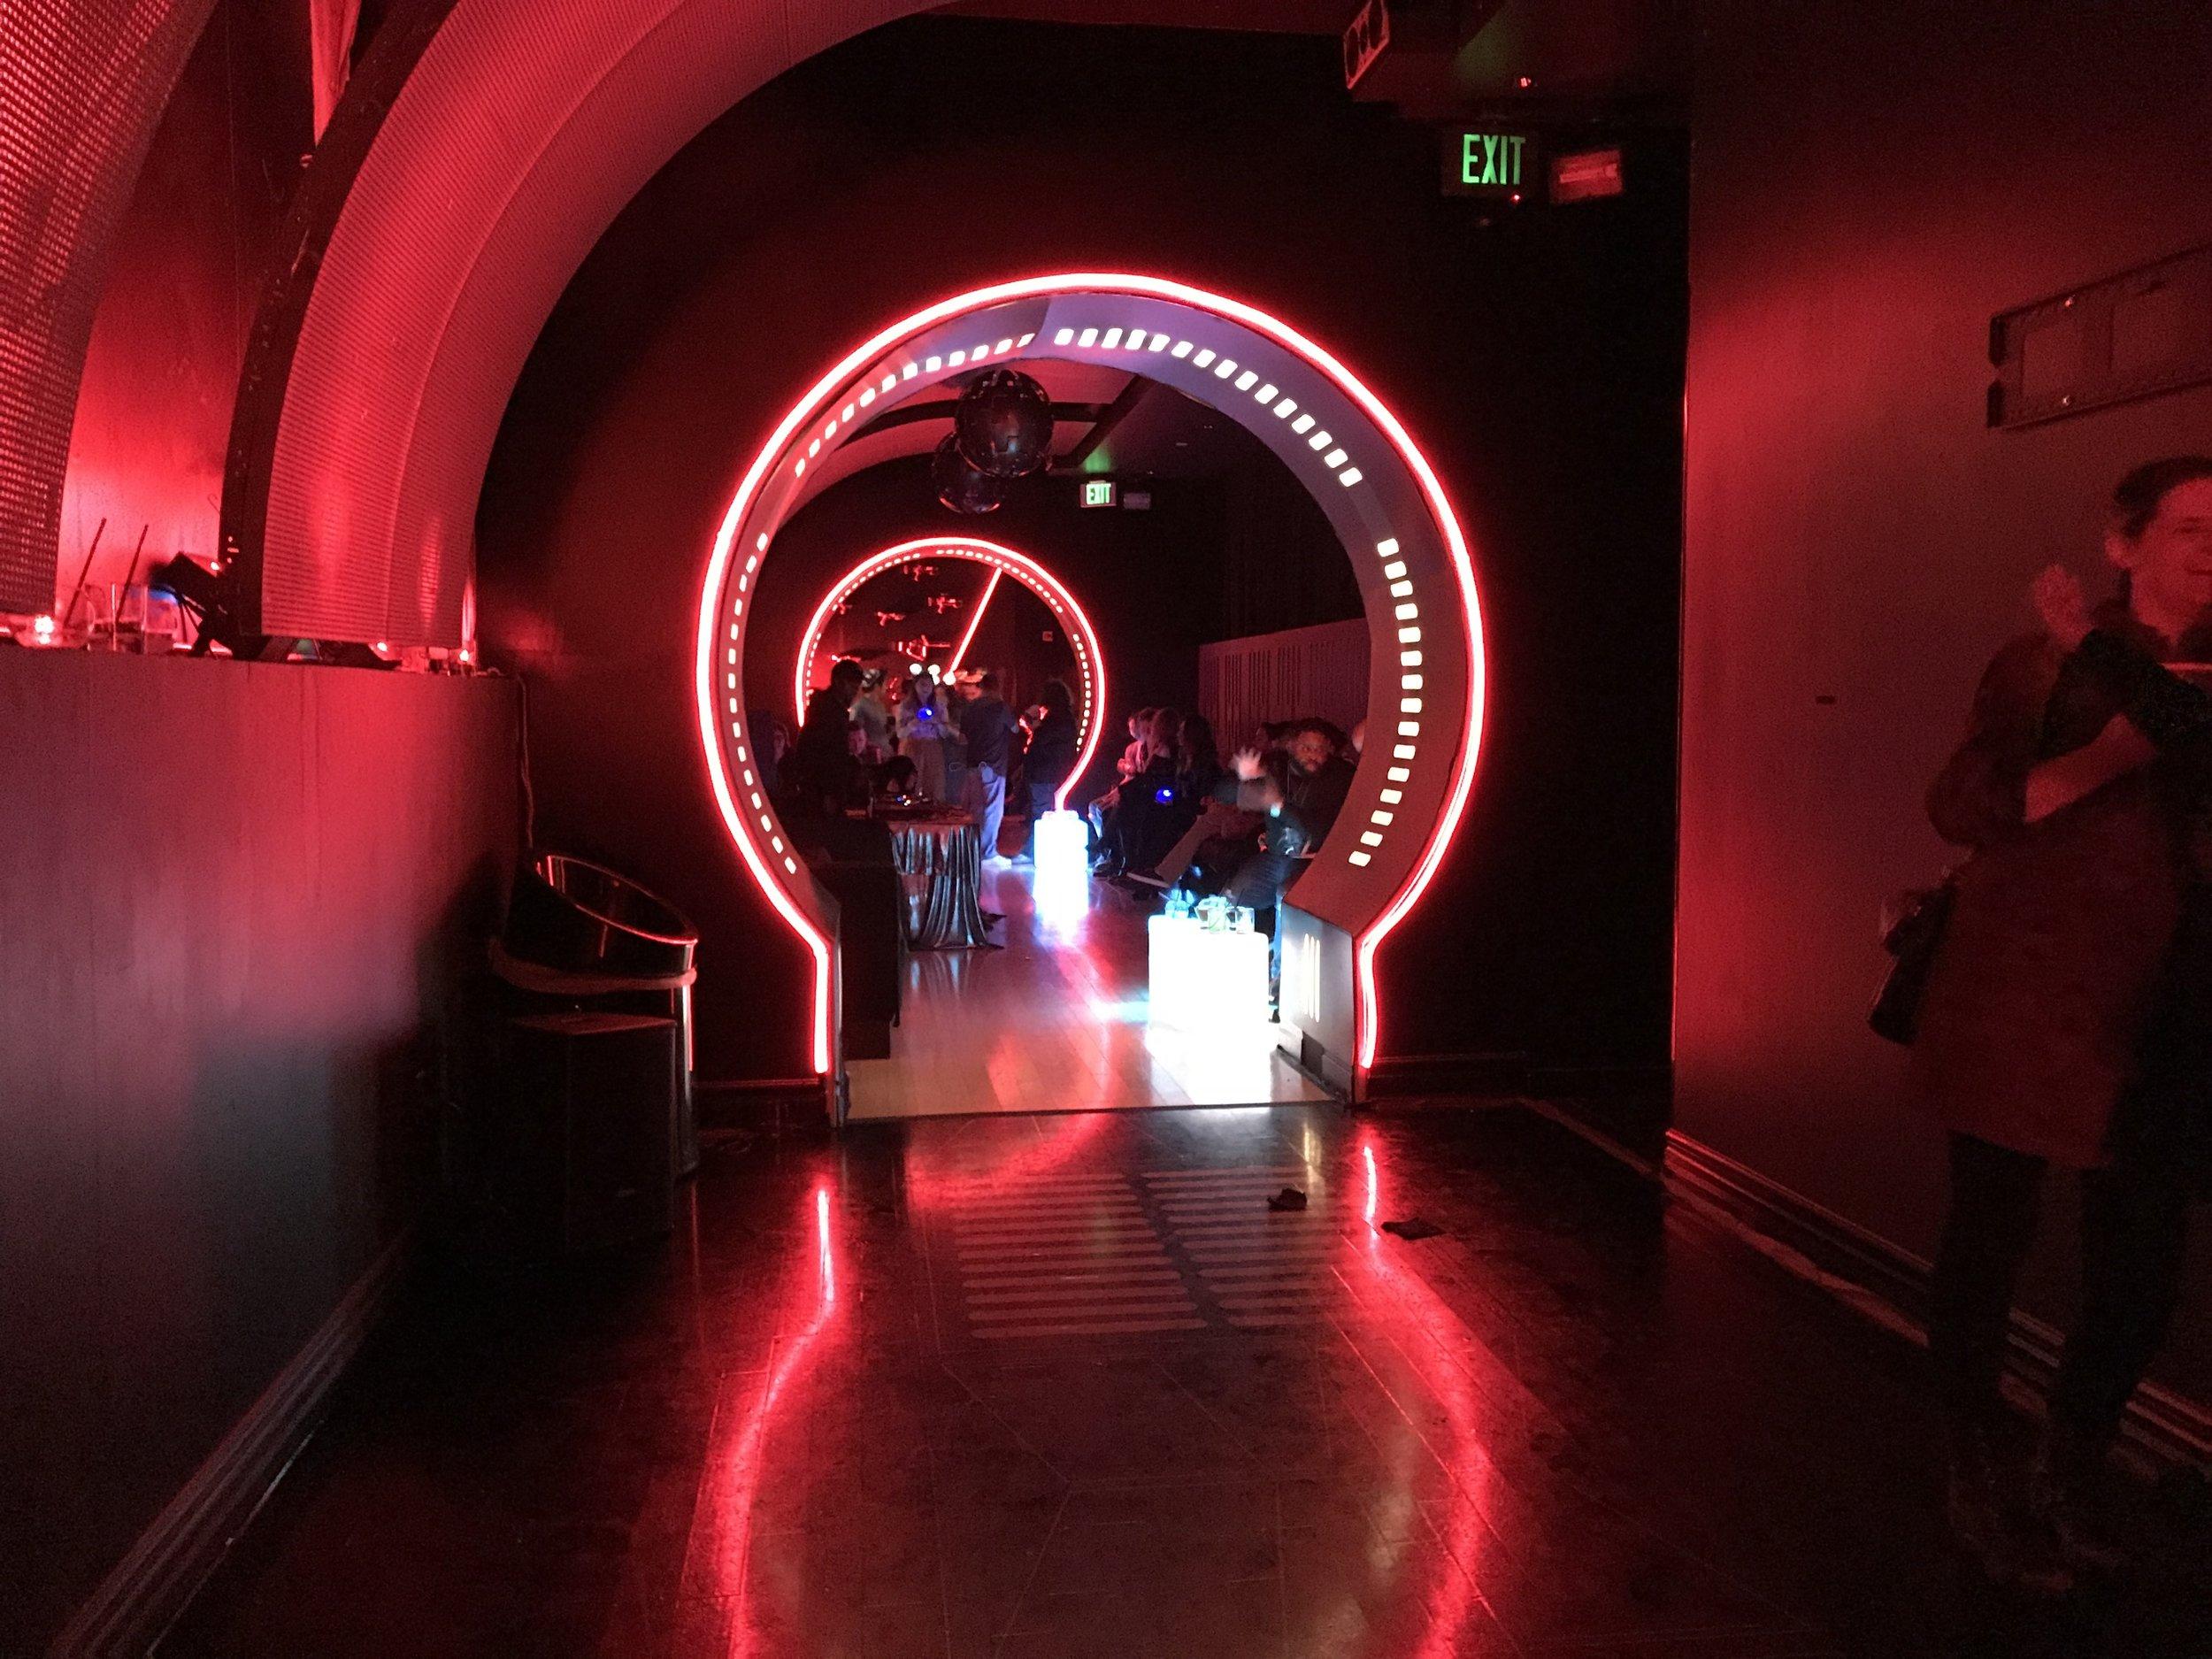 Bar Wars: A Night of Star Wars Bar Hopping in L.A.